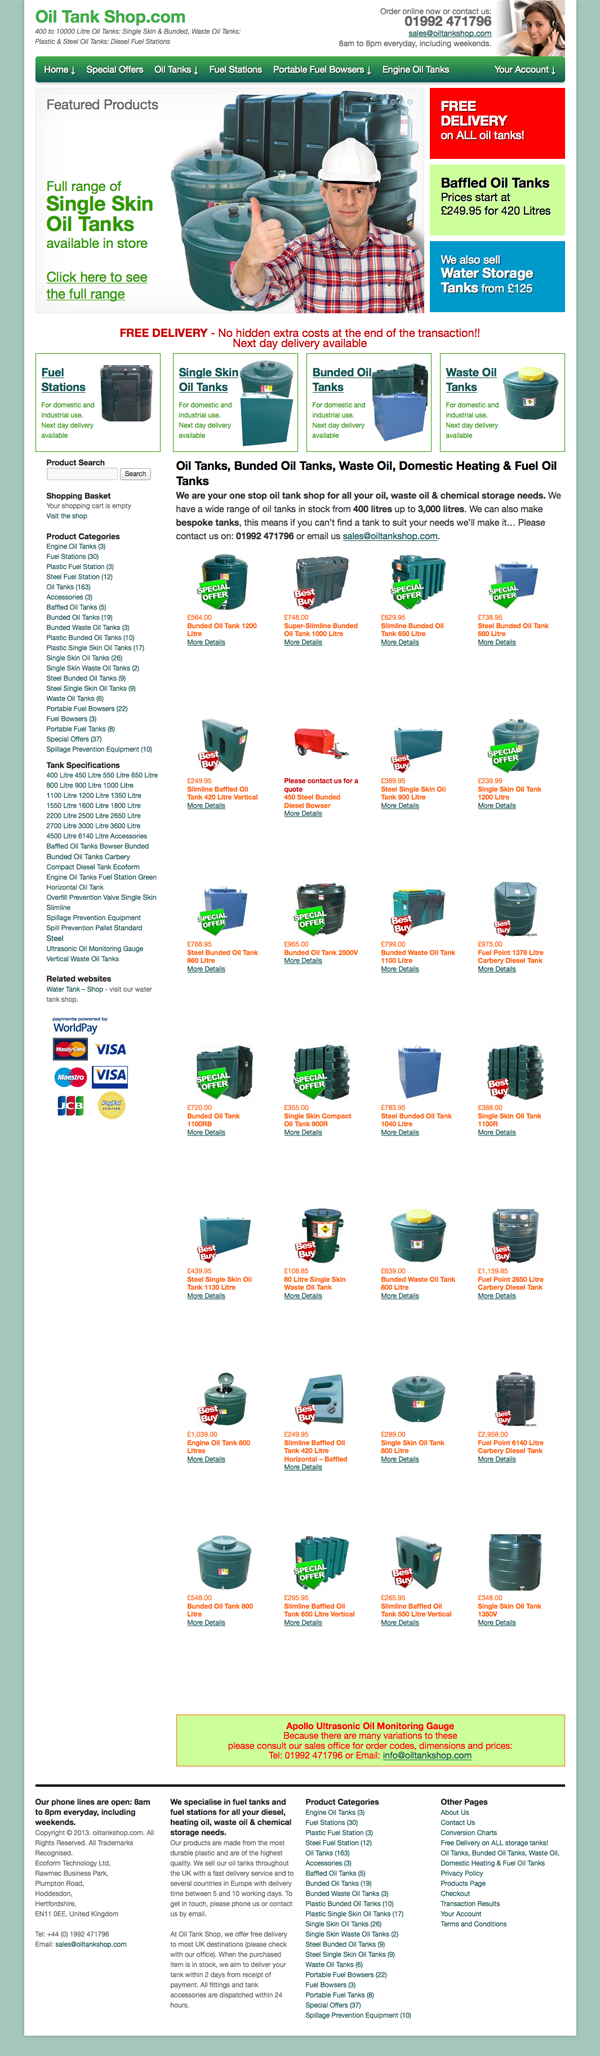 Oiltank Shop Home Page